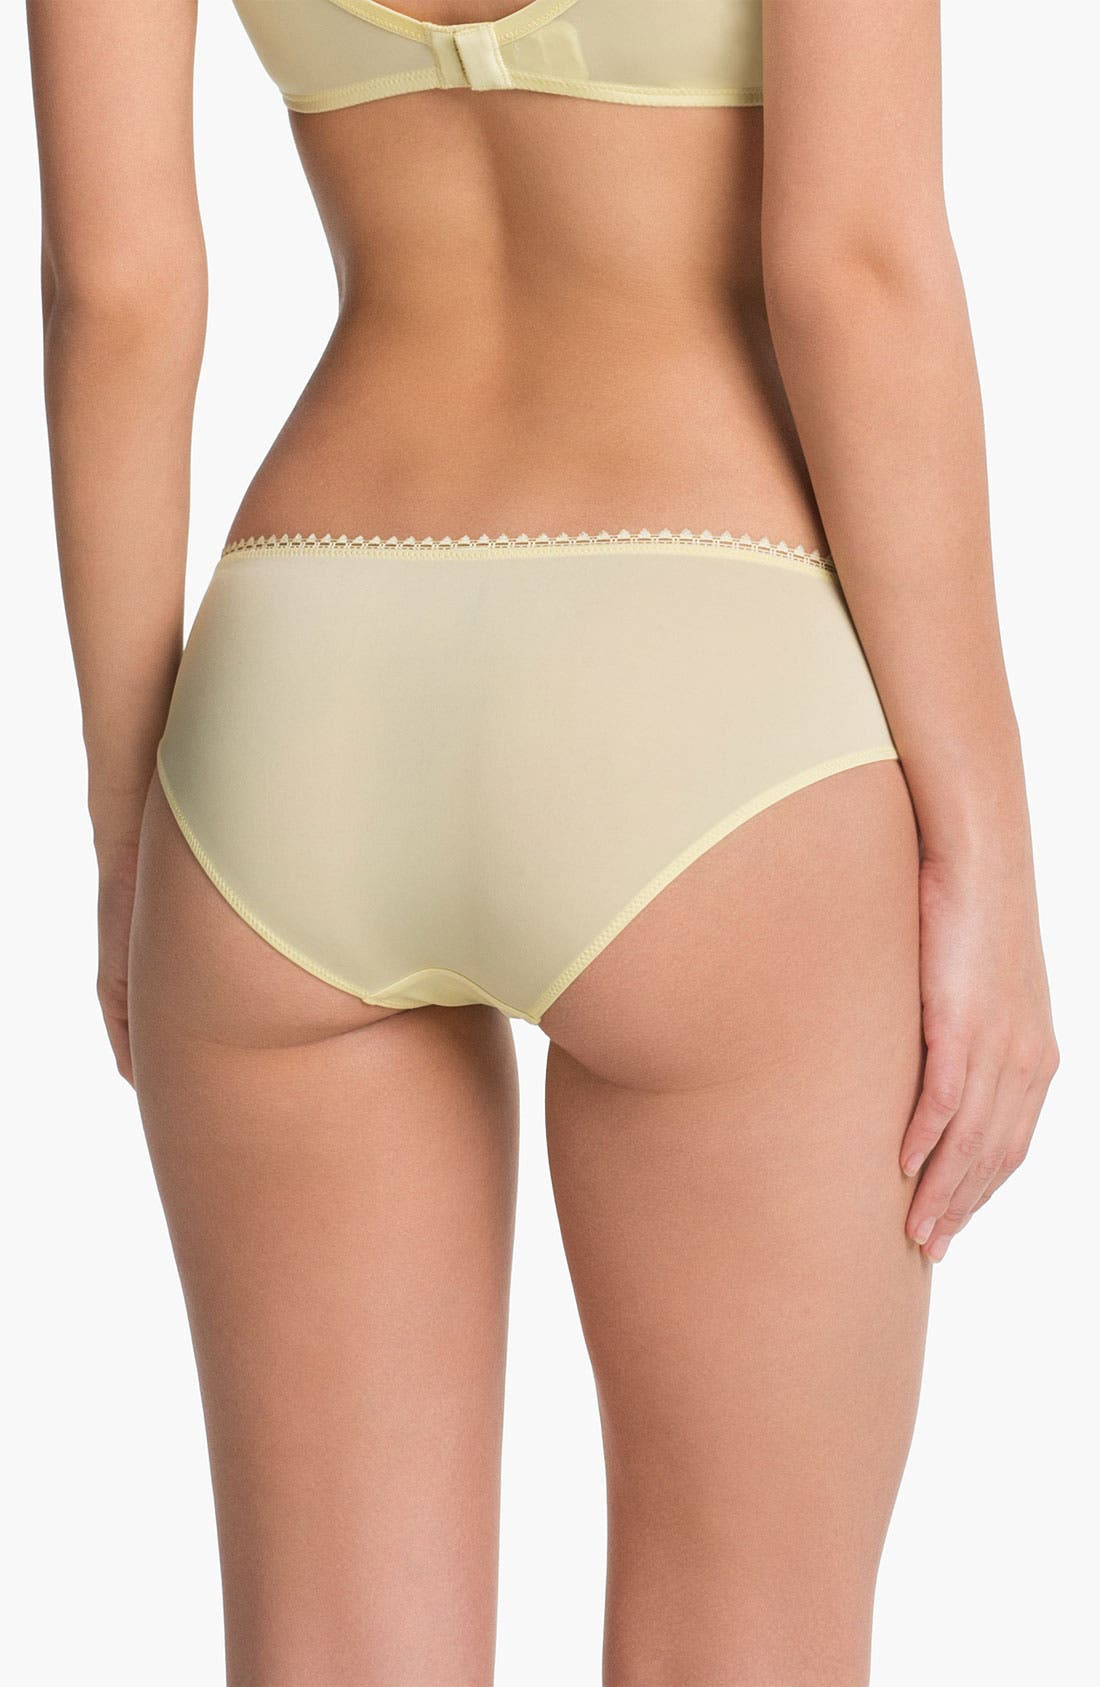 Alternate Image 2  - Miss Studio by La Perla 'Midsummer Flirt' Bikini